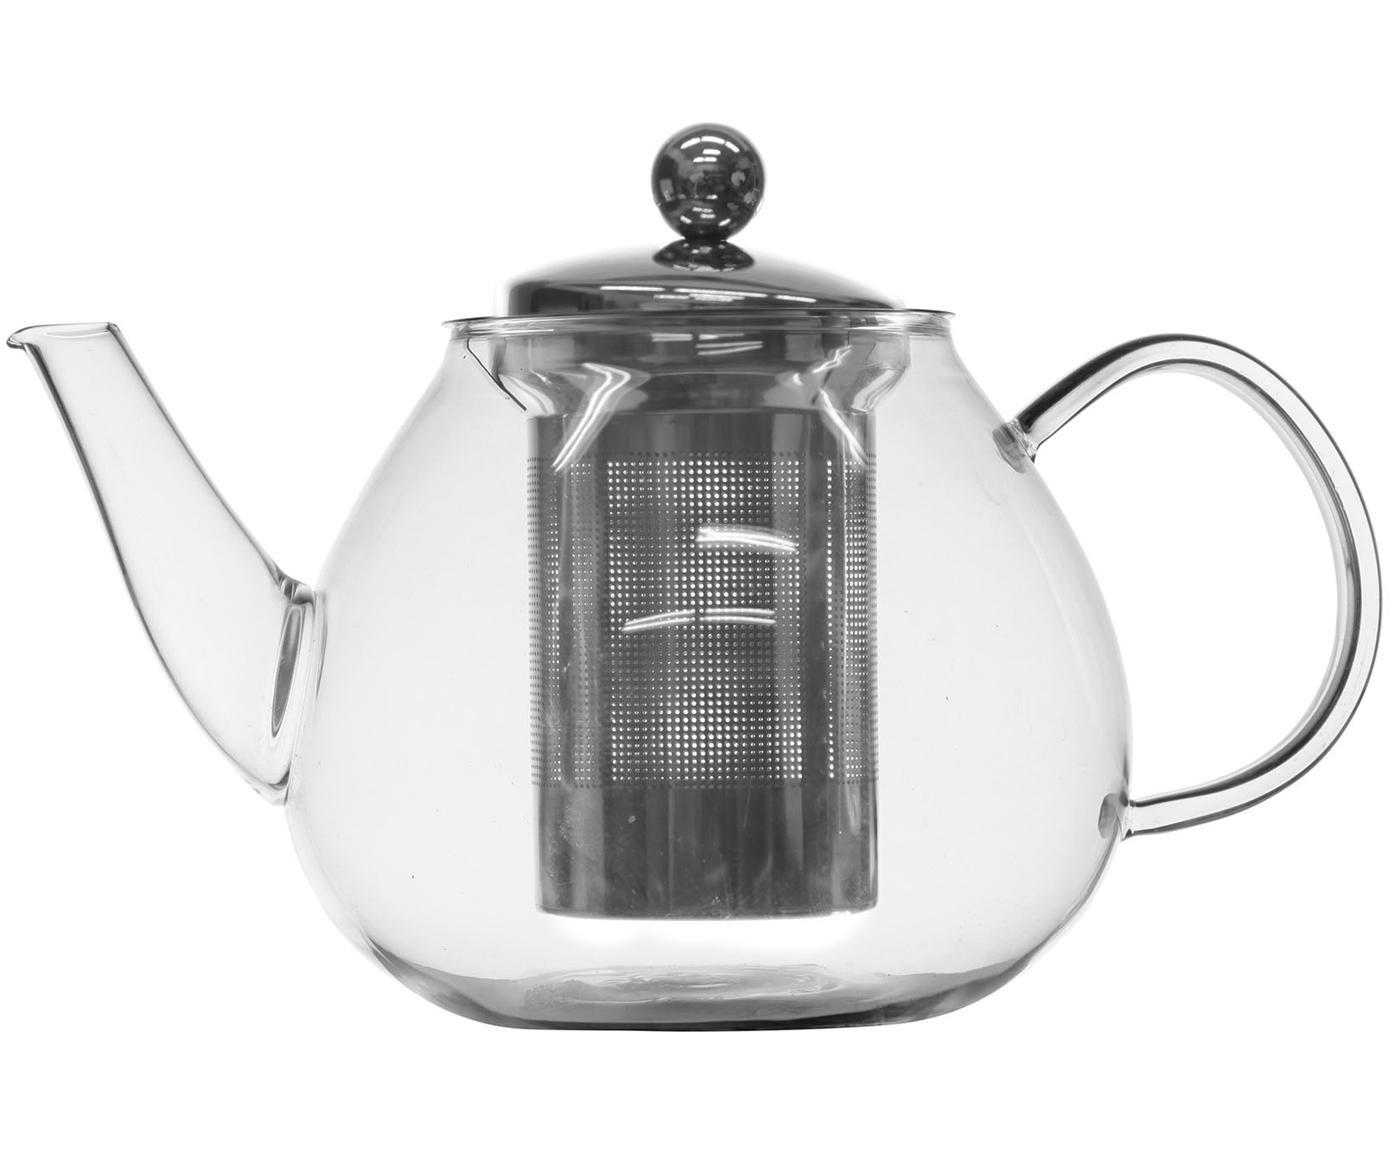 Teiera Archie, Brocca: vetro, Trasparente, argentato, Larg. 23 x Alt. 14 cm